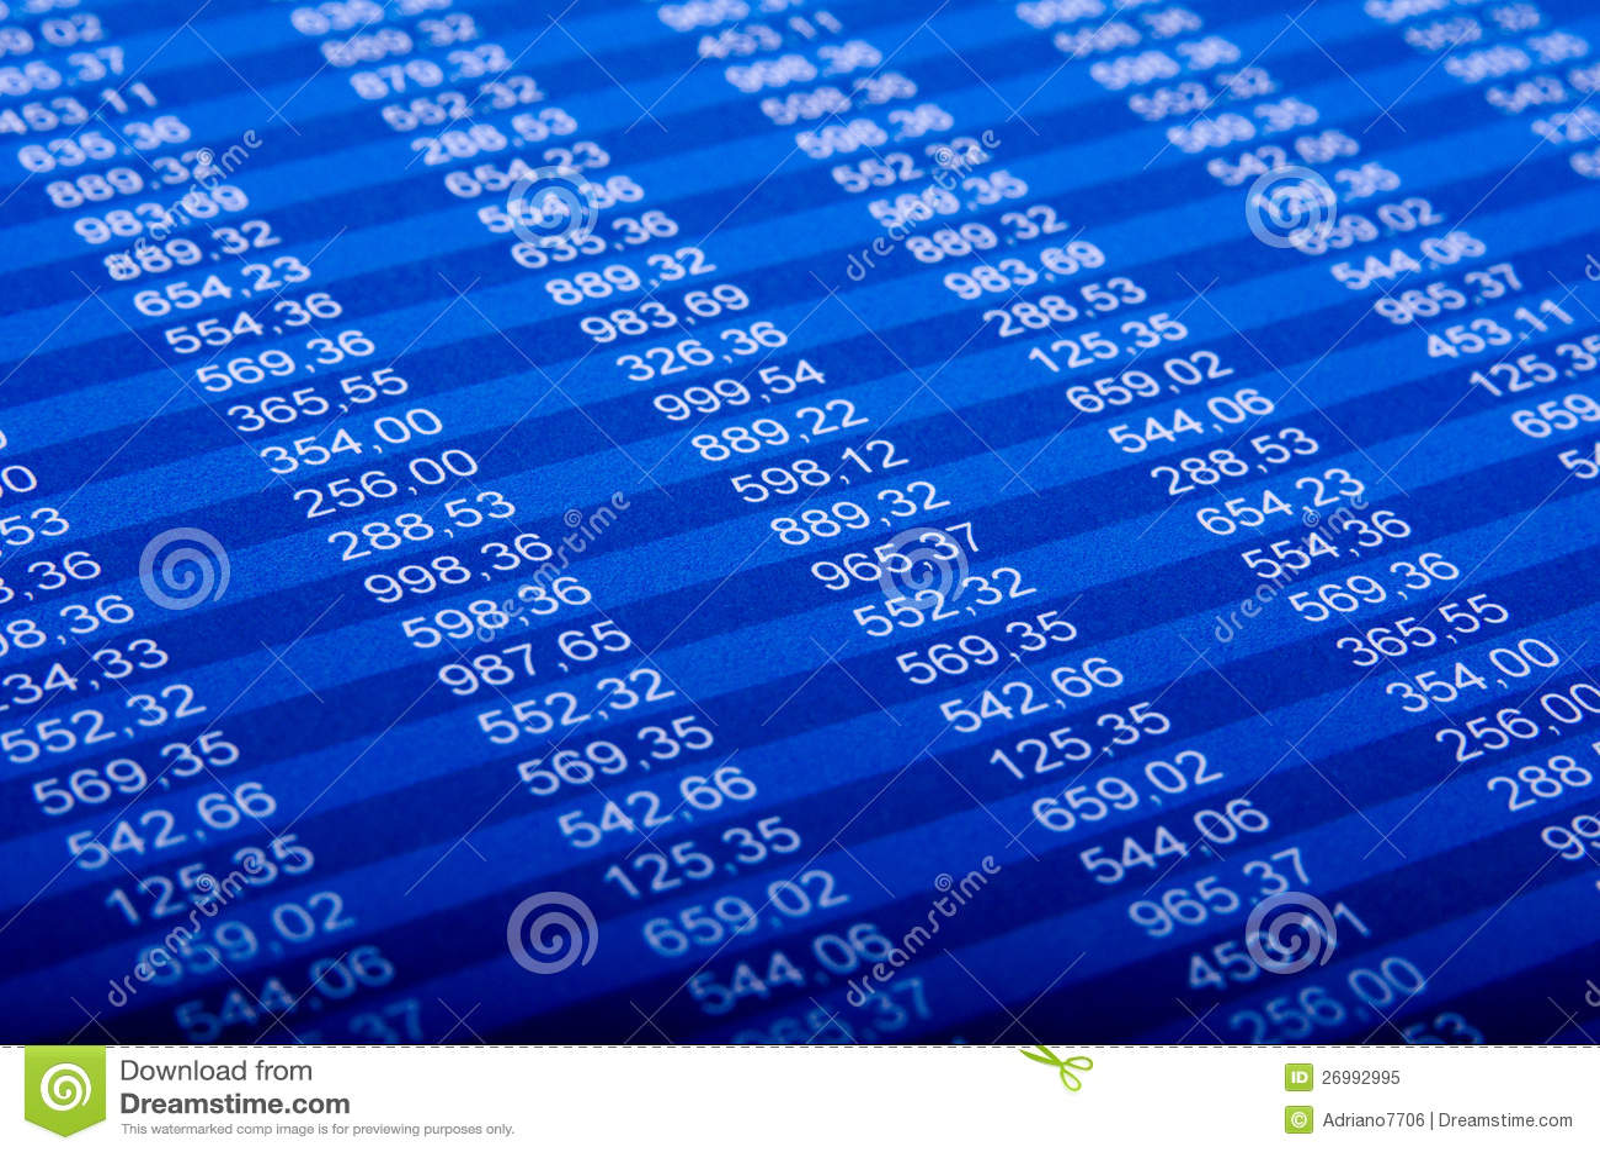 Finansiell rapport